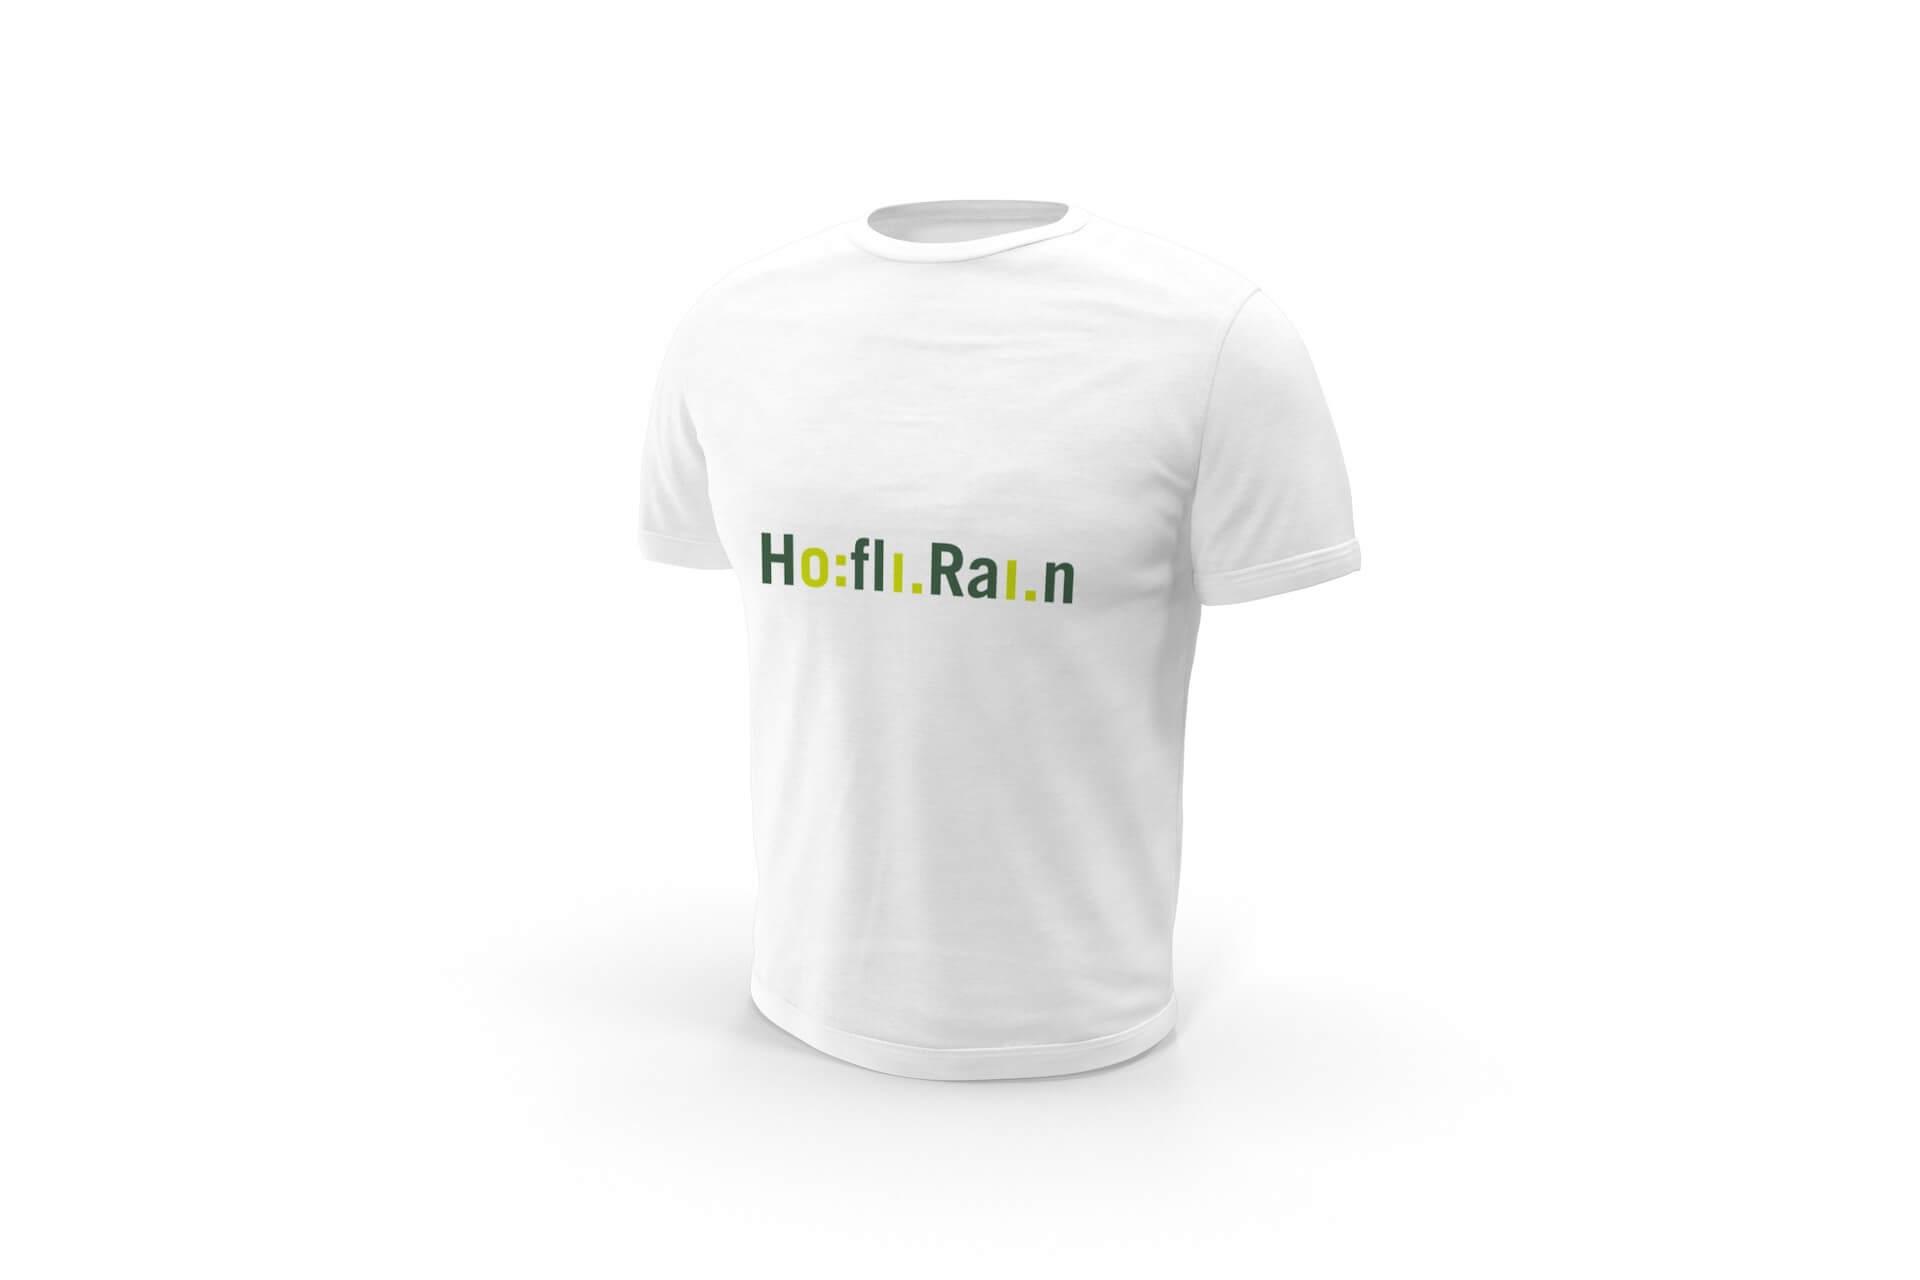 höflirain_shirtLogo